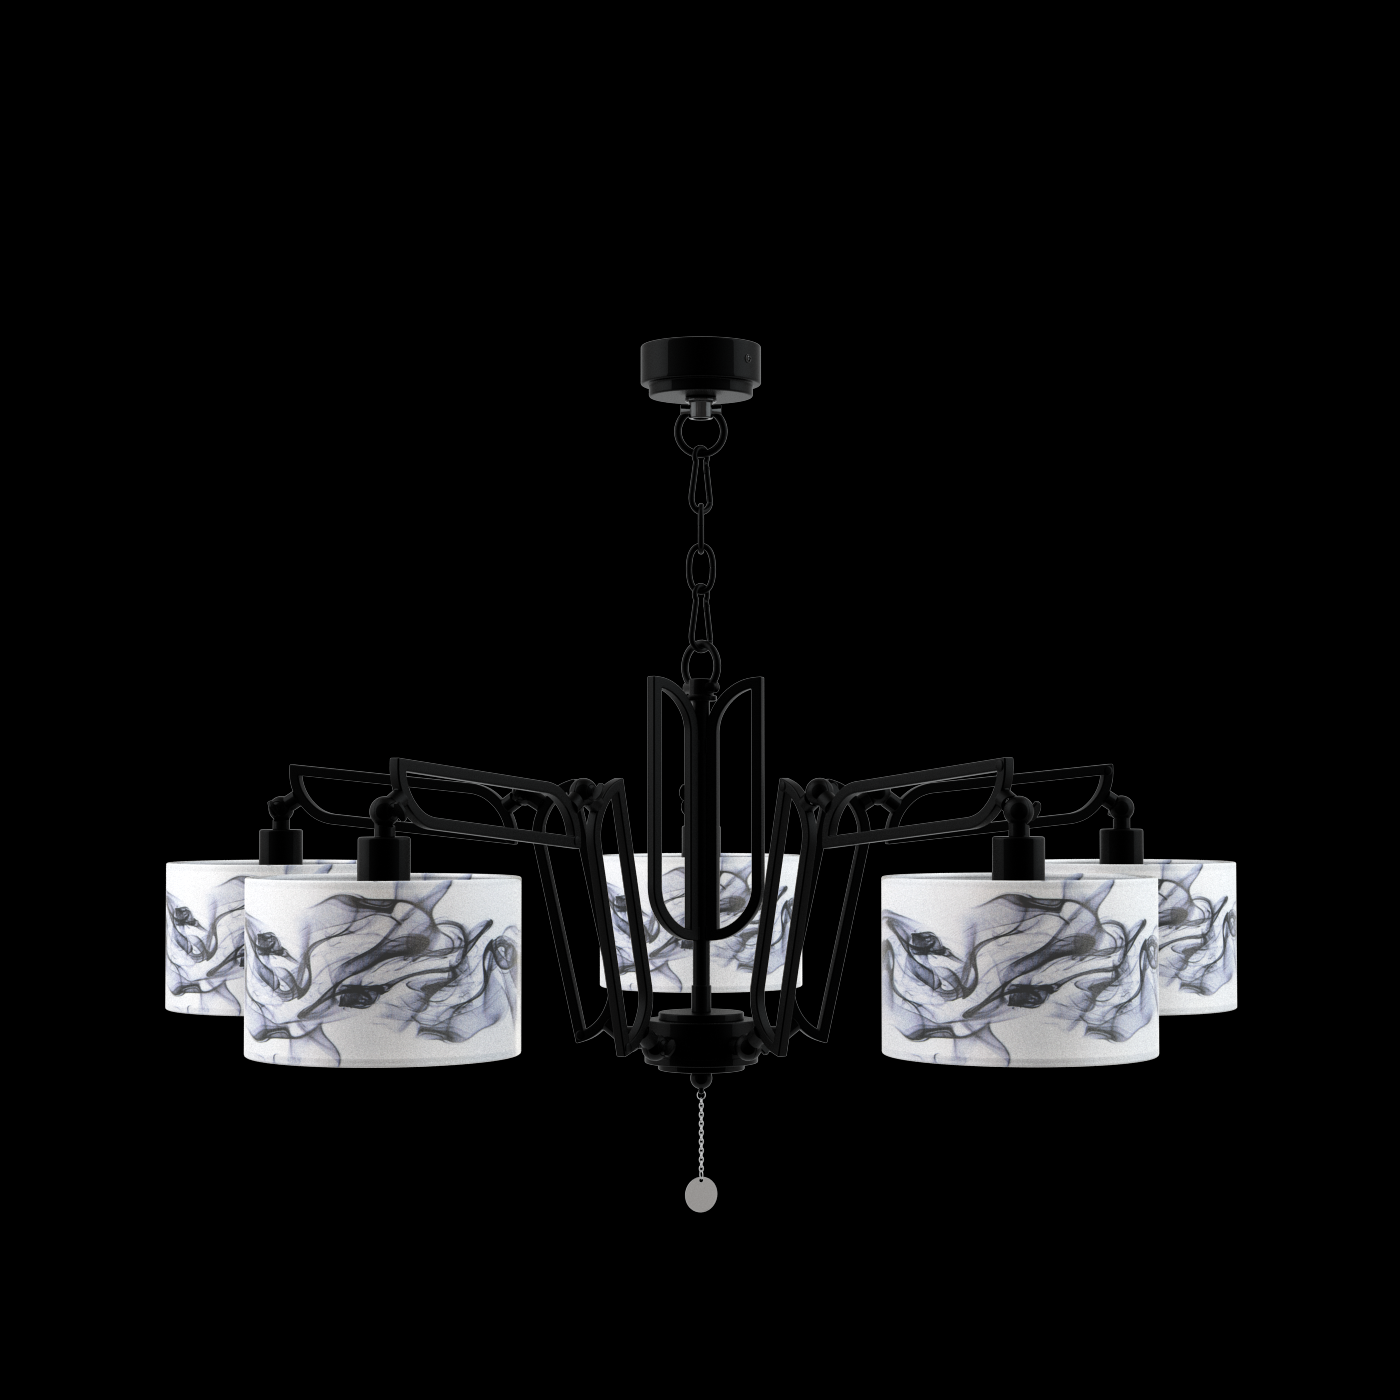 Фото товара M1-05-BM-LMP-Y-10 Lamp4You